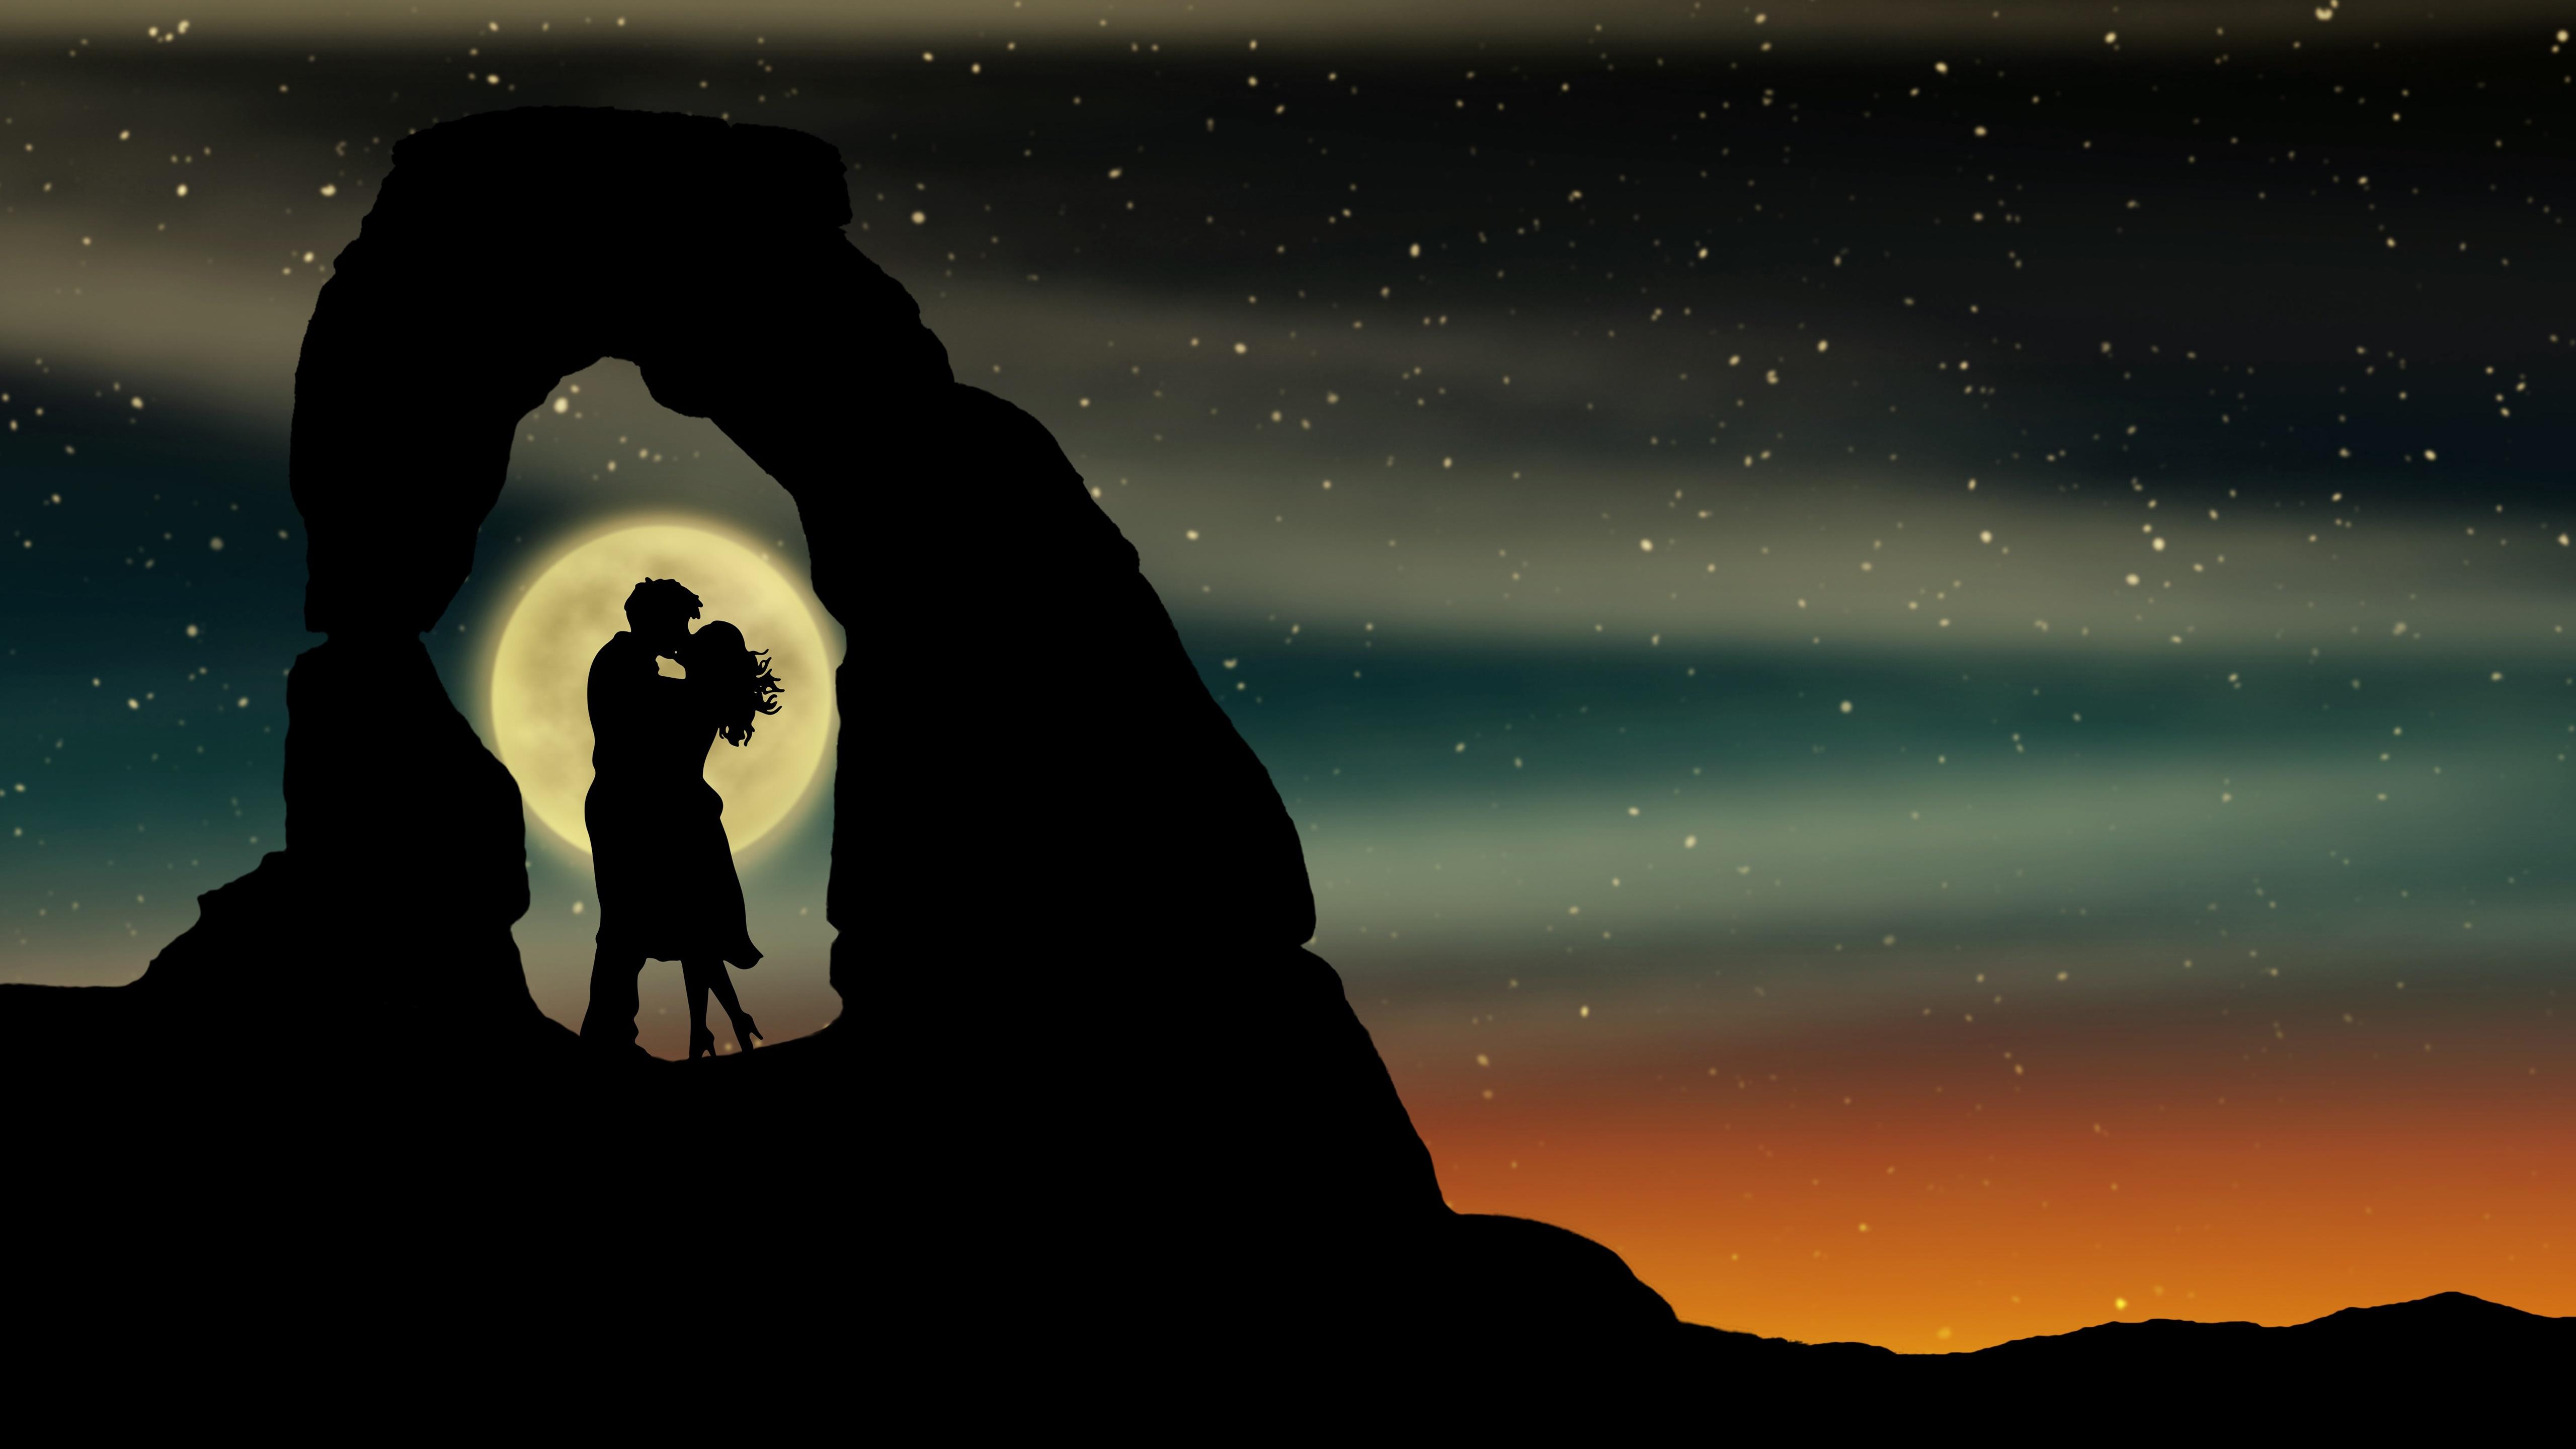 Kissing at full moon wallpaper